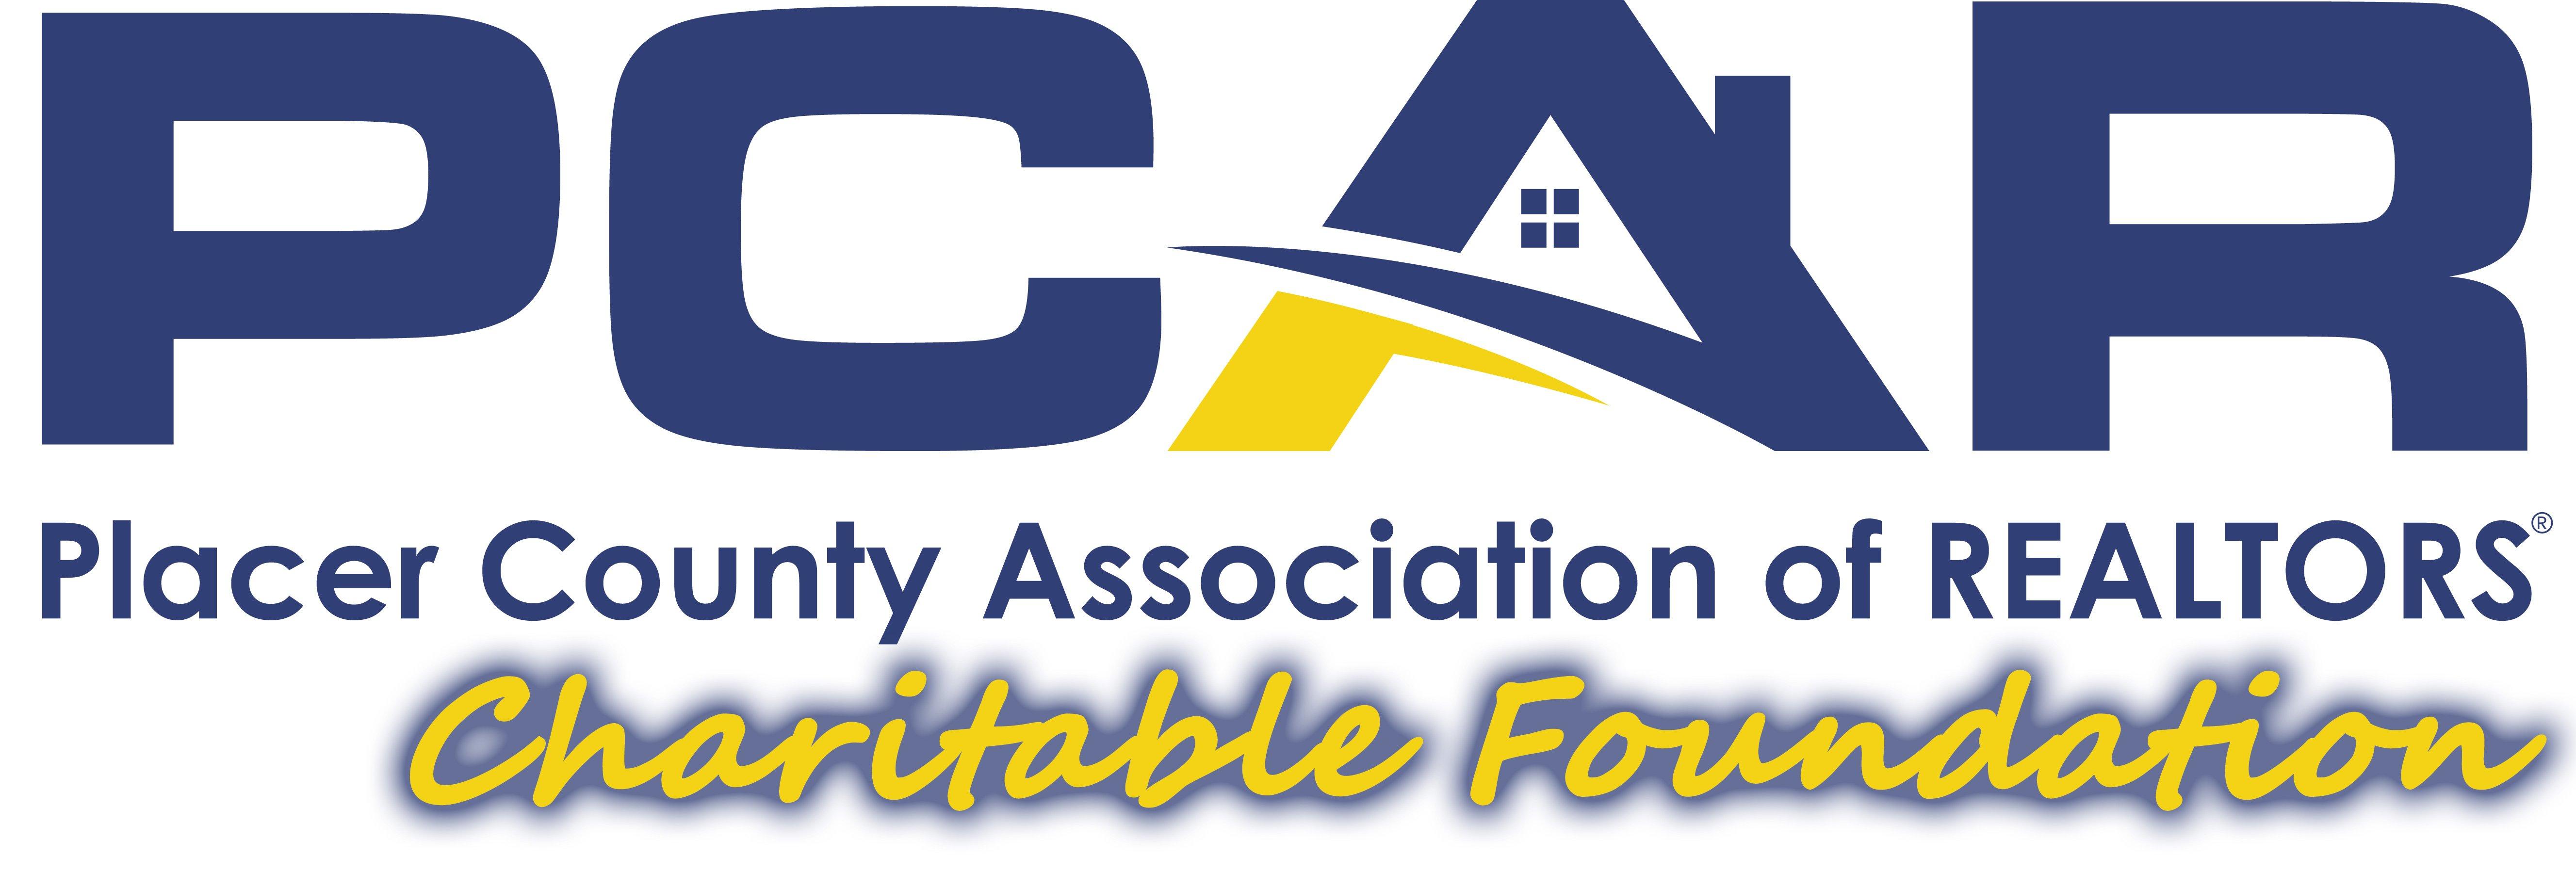 PCAR-CharitableFoundation